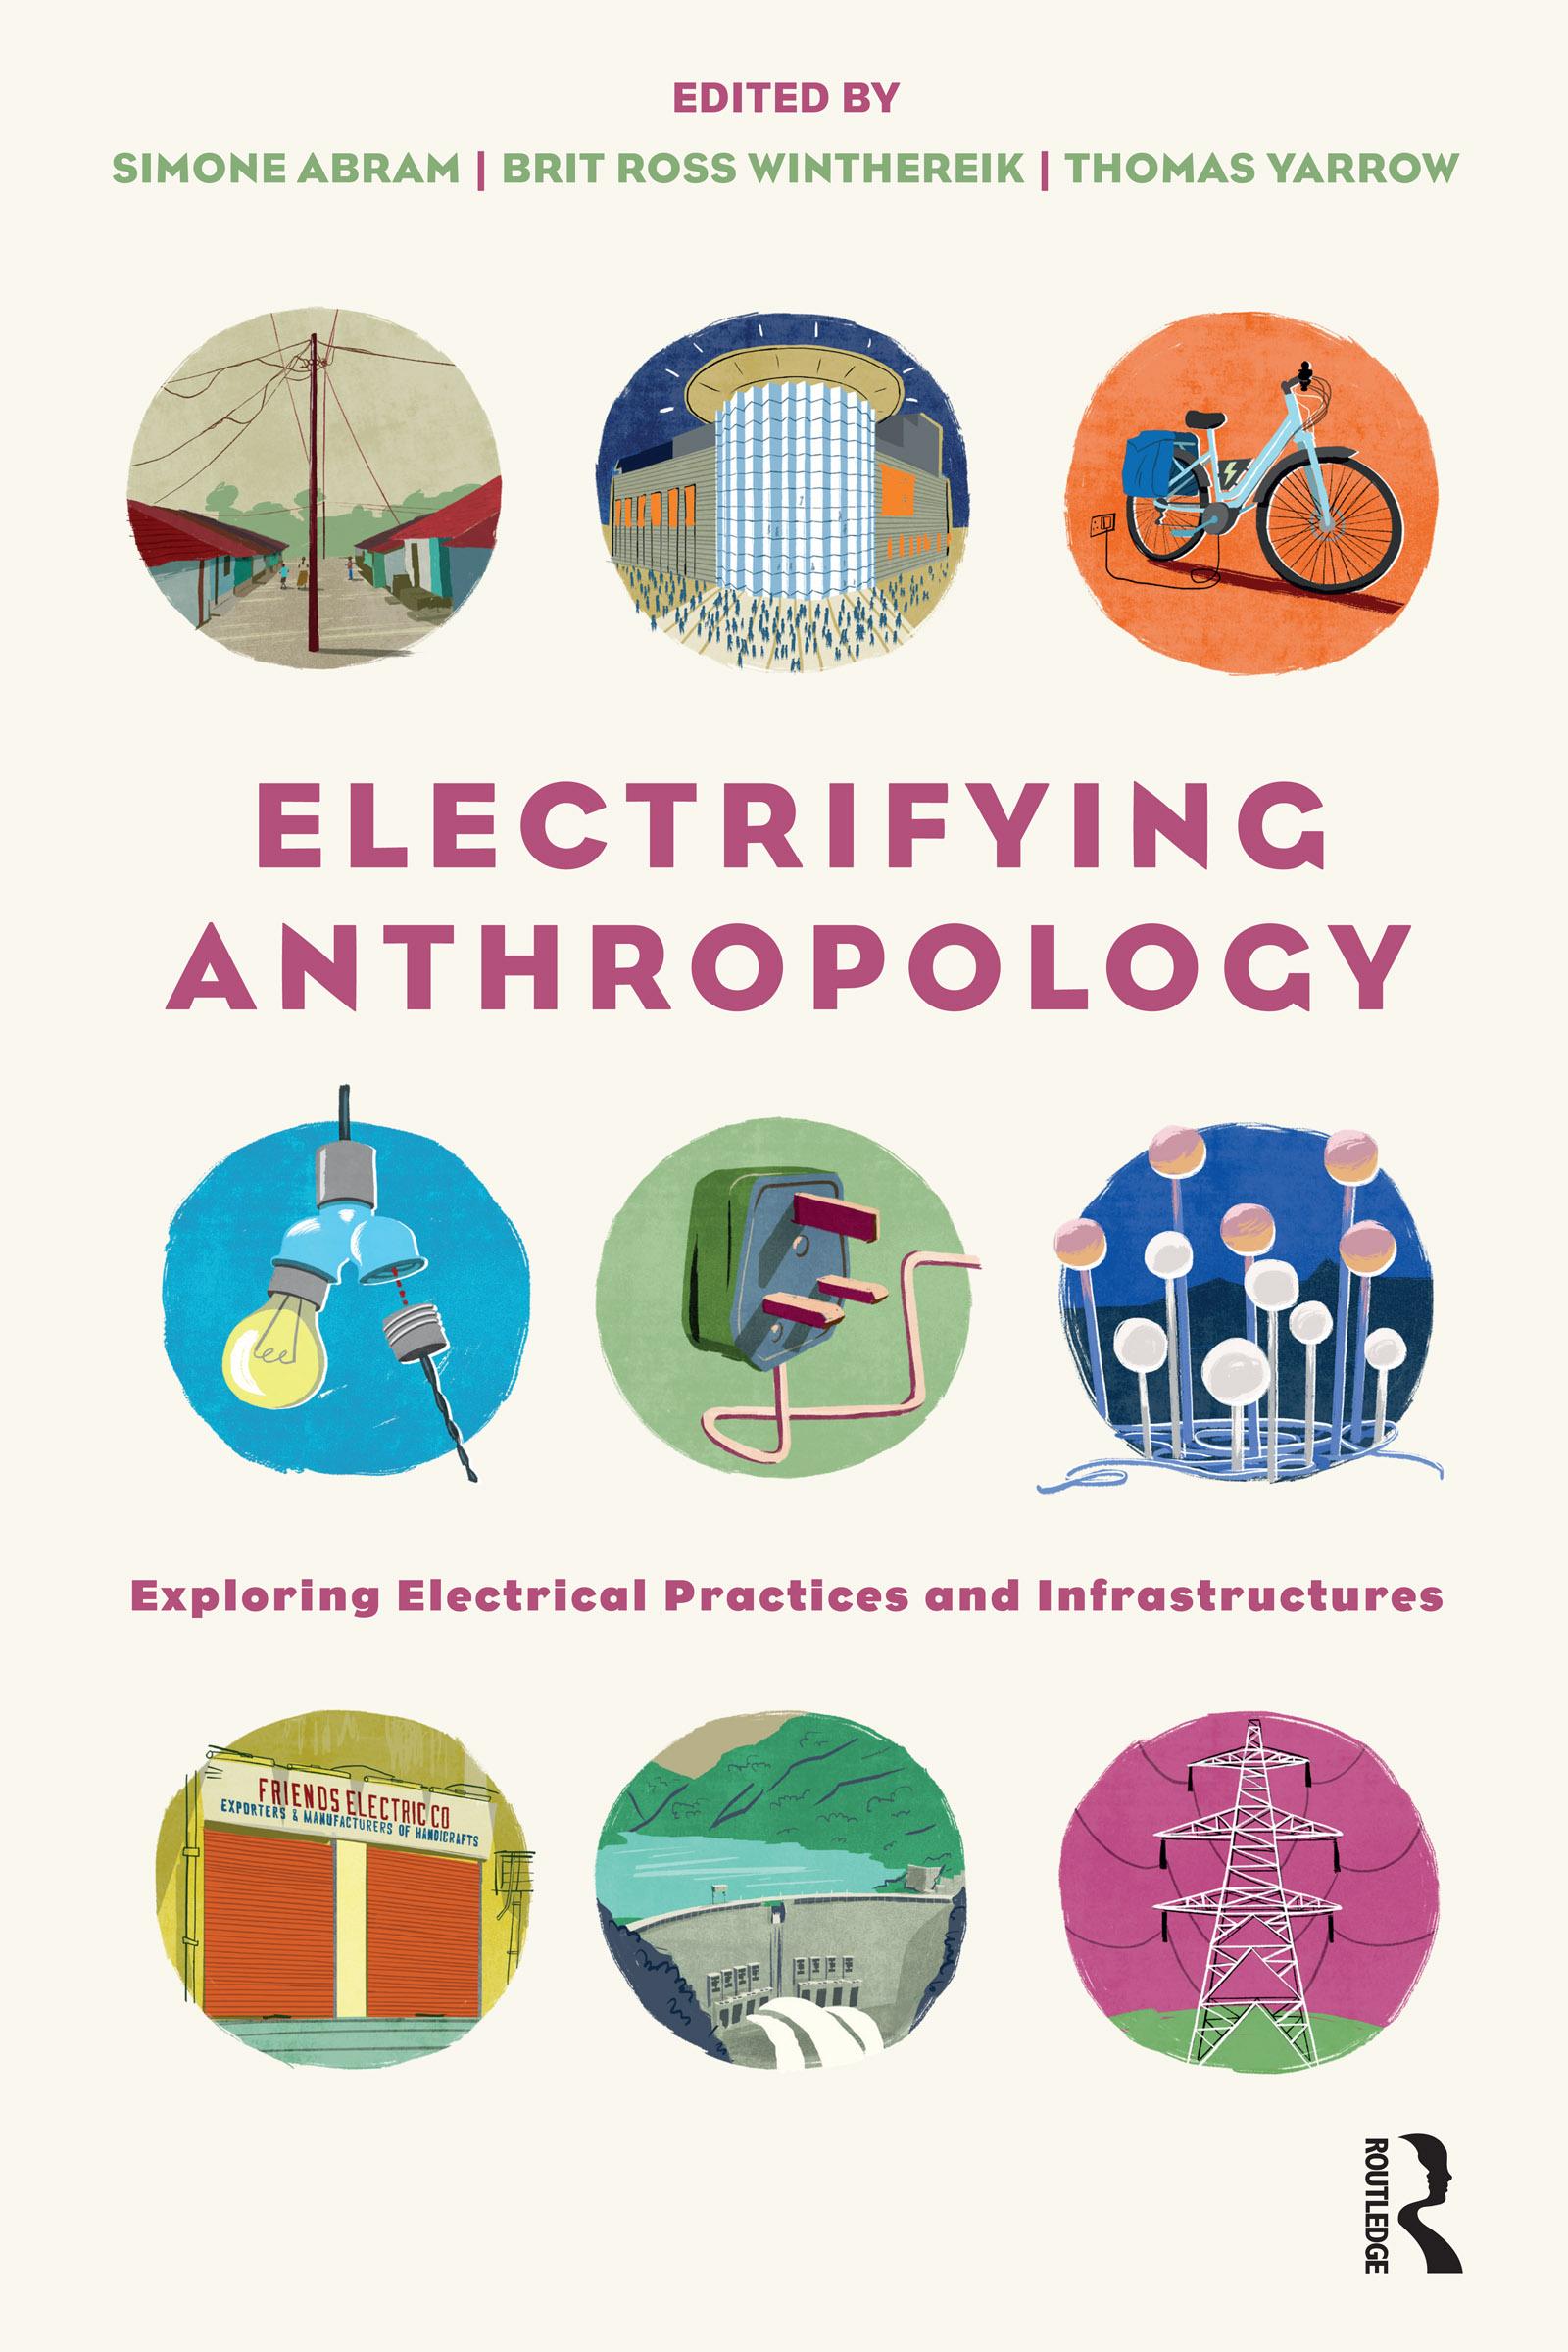 Electrifying Anthropology